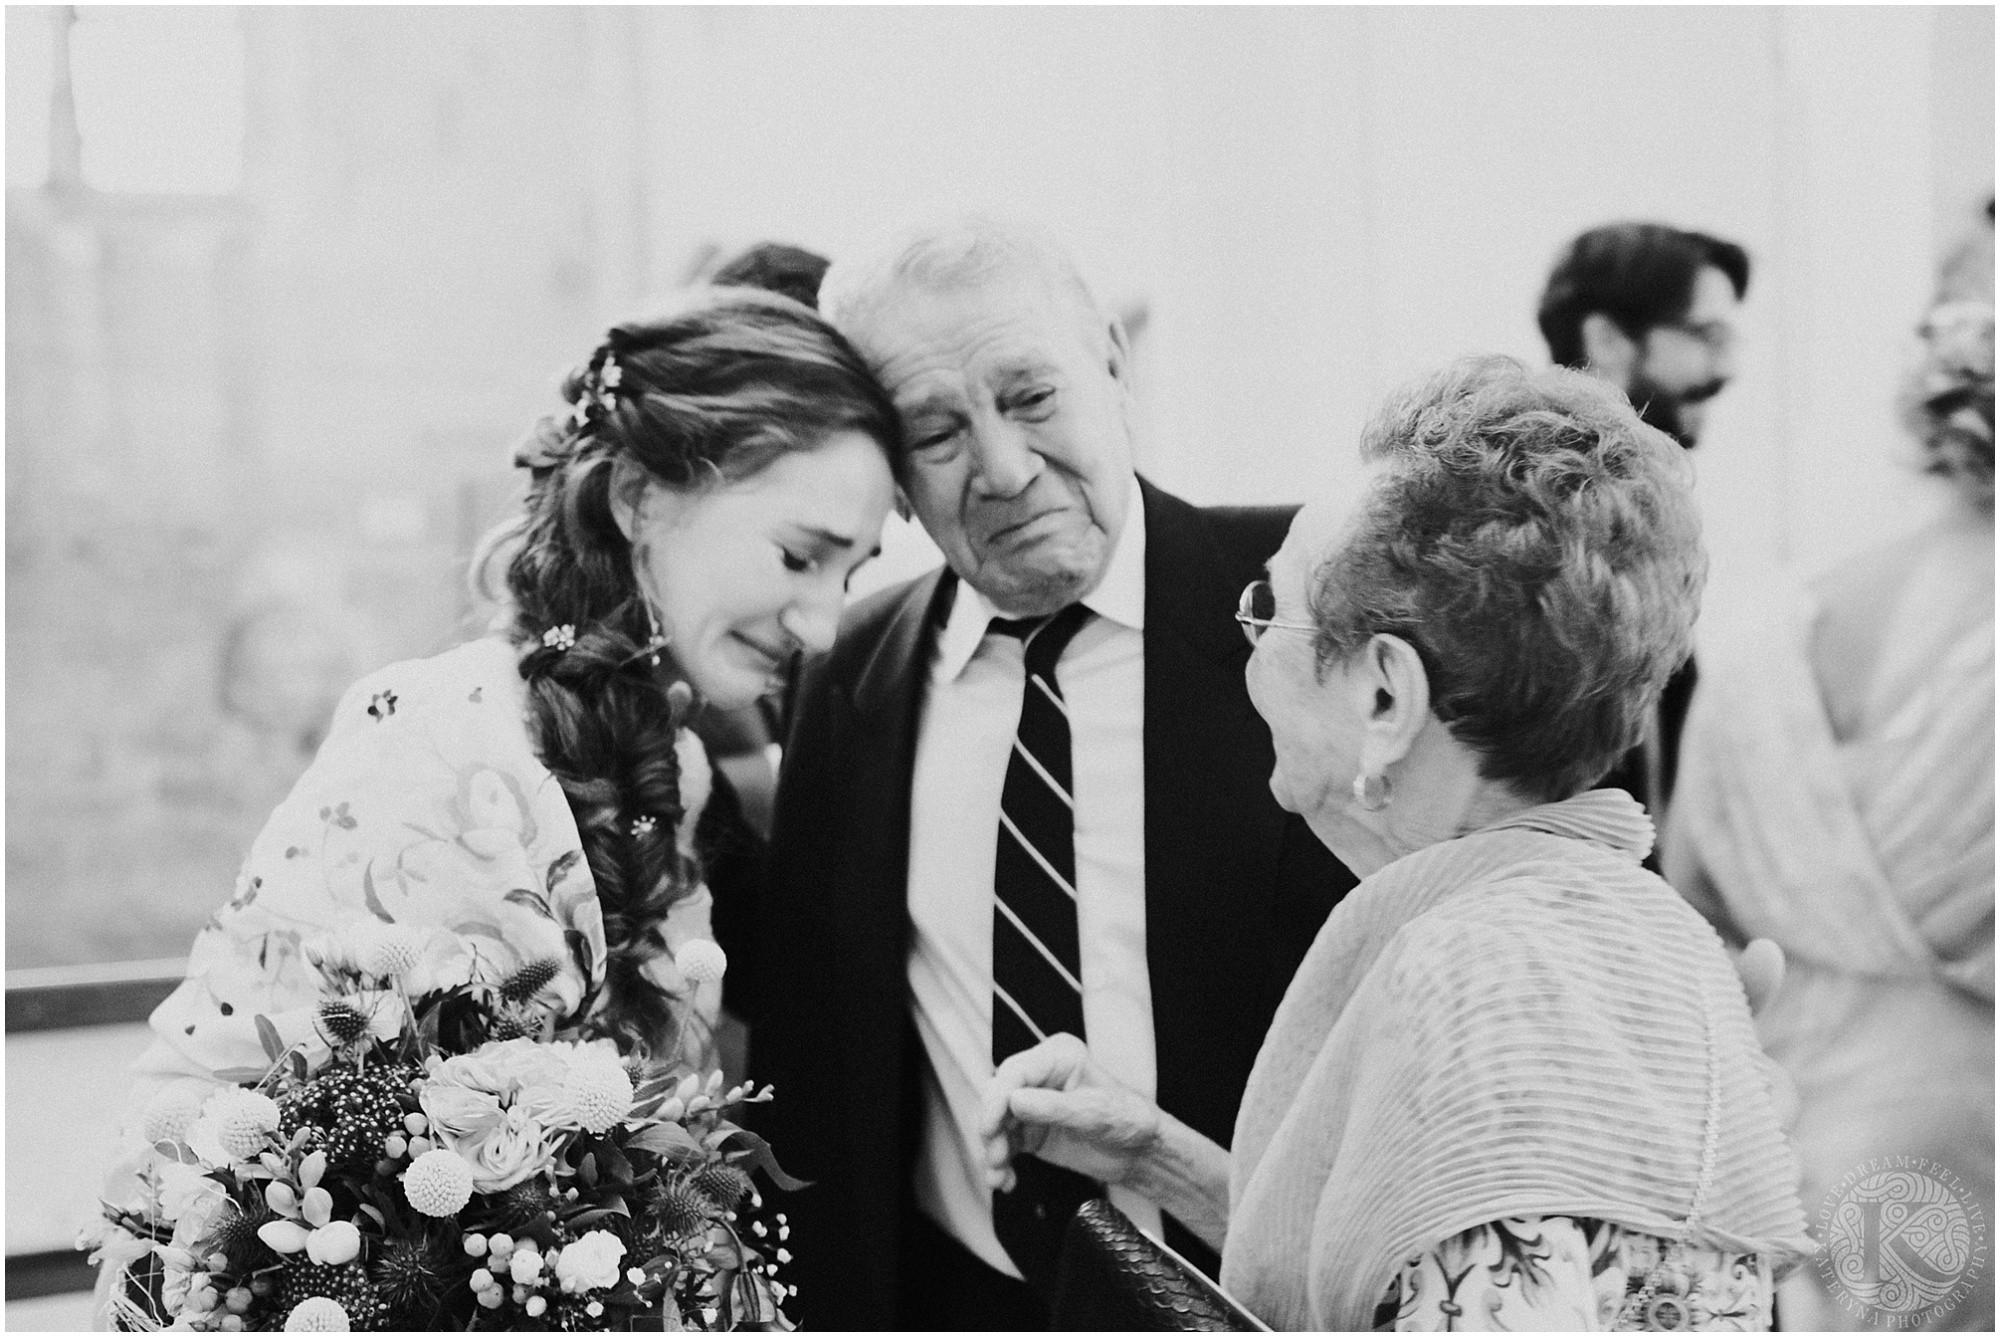 Kateryna-photos-photographe-mariage-vaucluse-provence-avignon-ferme-st-hugues_0033.jpg